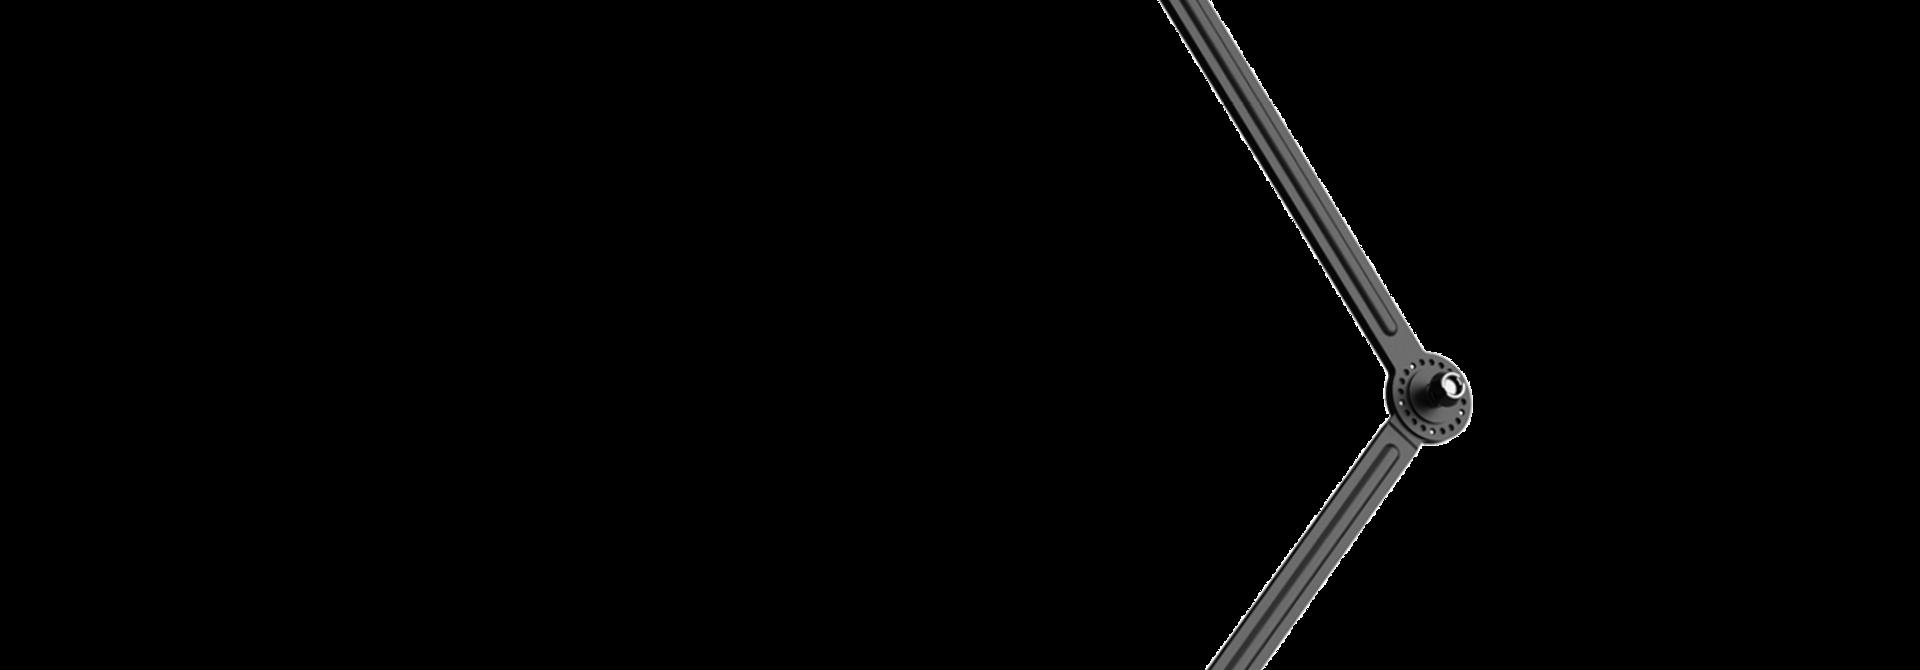 Bolt Ceiling 2Arm Sidefit